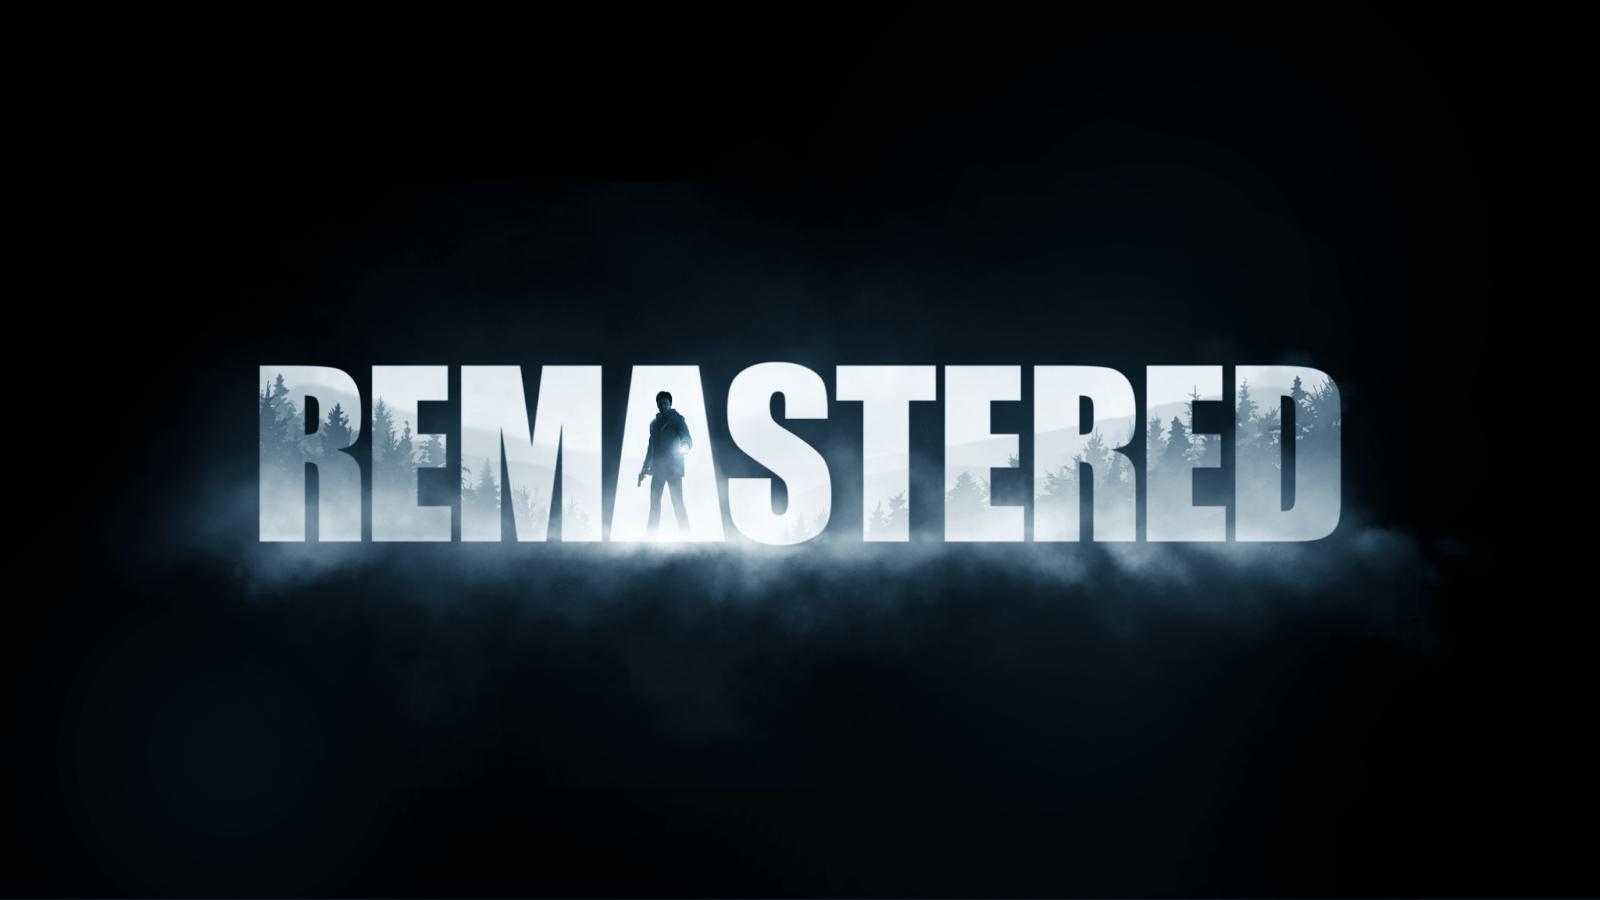 Слухи подтвердились: Alan Wake Remastered выйдет осенью 2021 года (egp akqa deer logo remastered teaser)